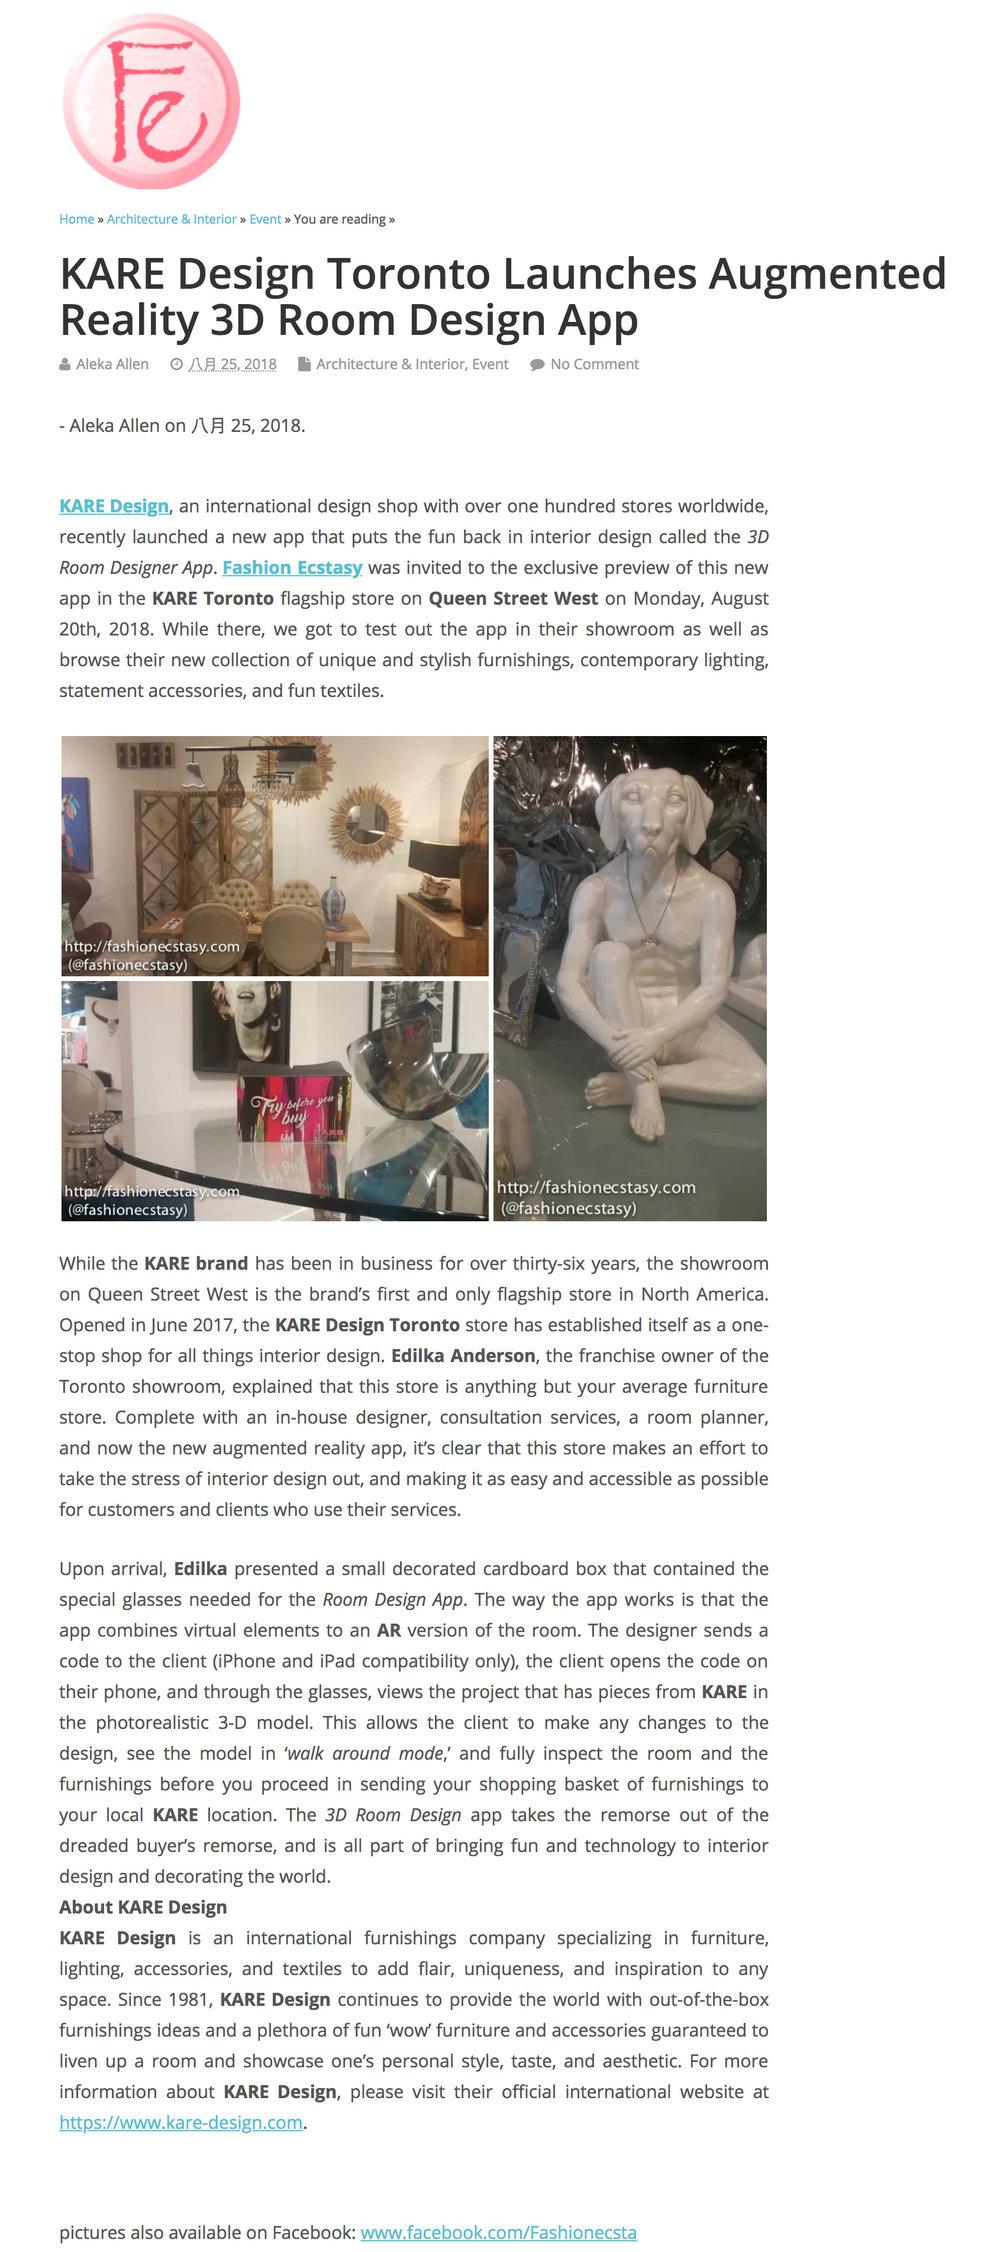 KARE Design Featured in  Fashion Ecstasy .